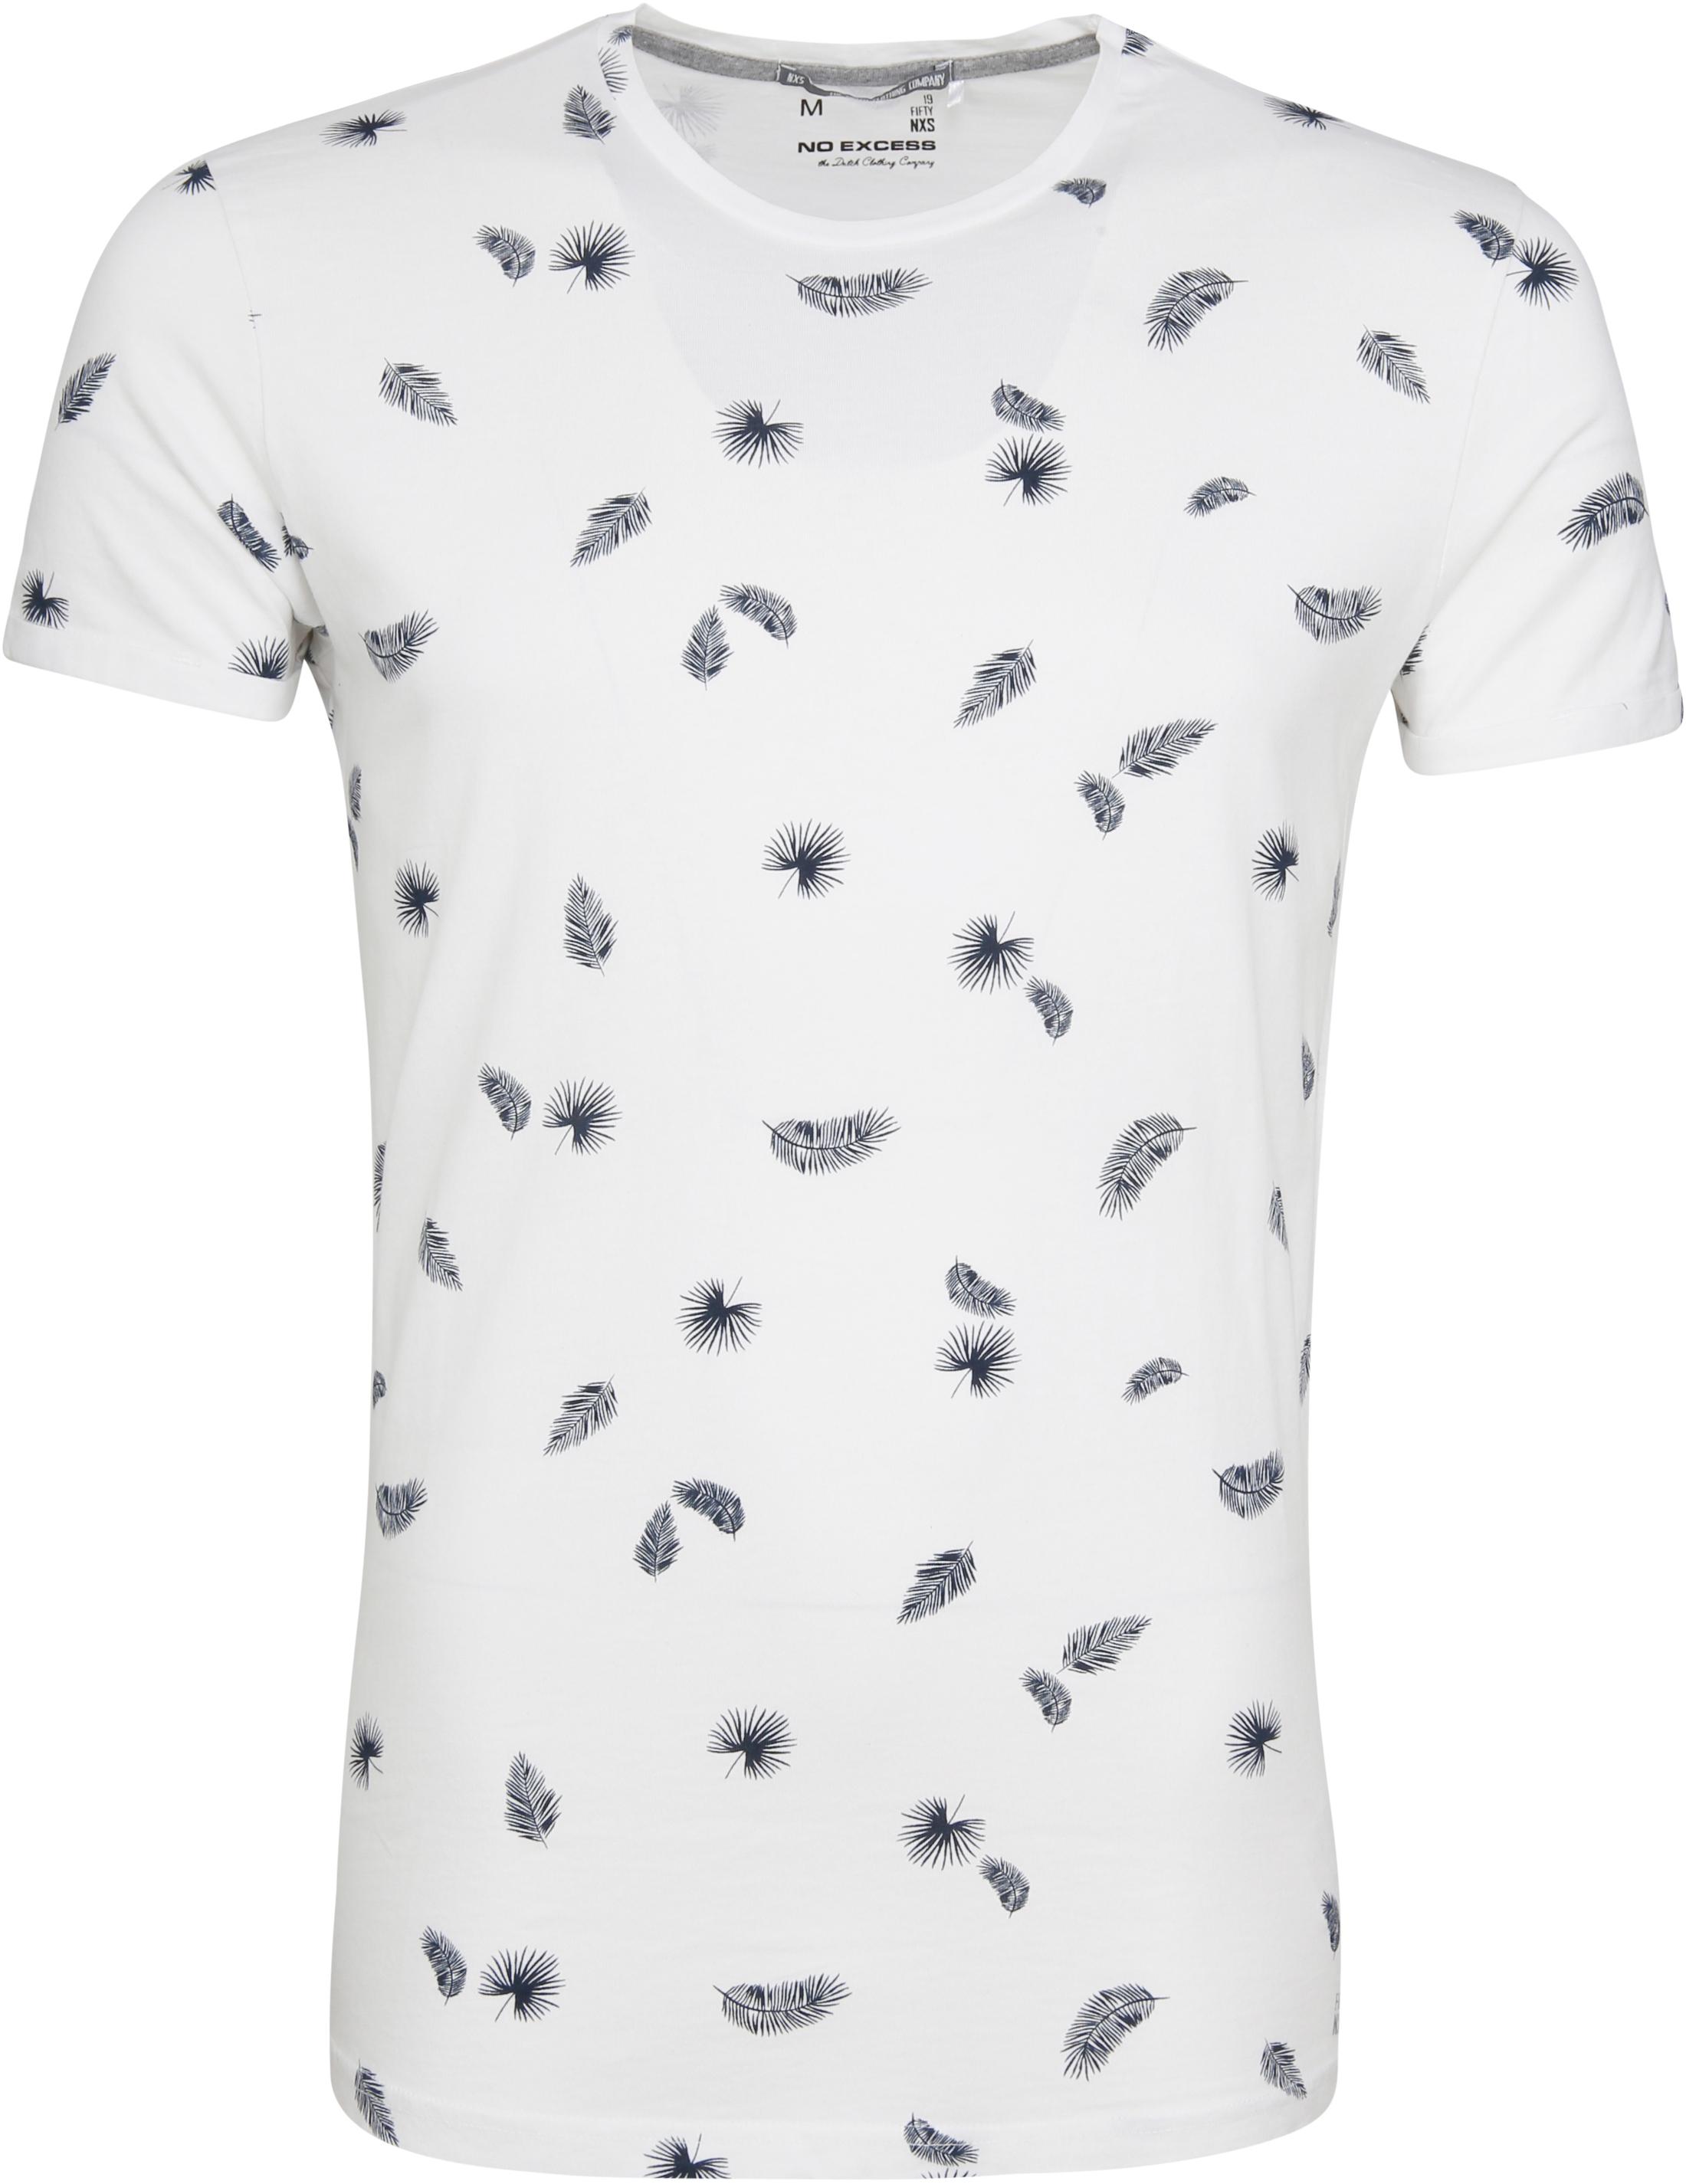 No-Excess T-shirt Palm Print White foto 0